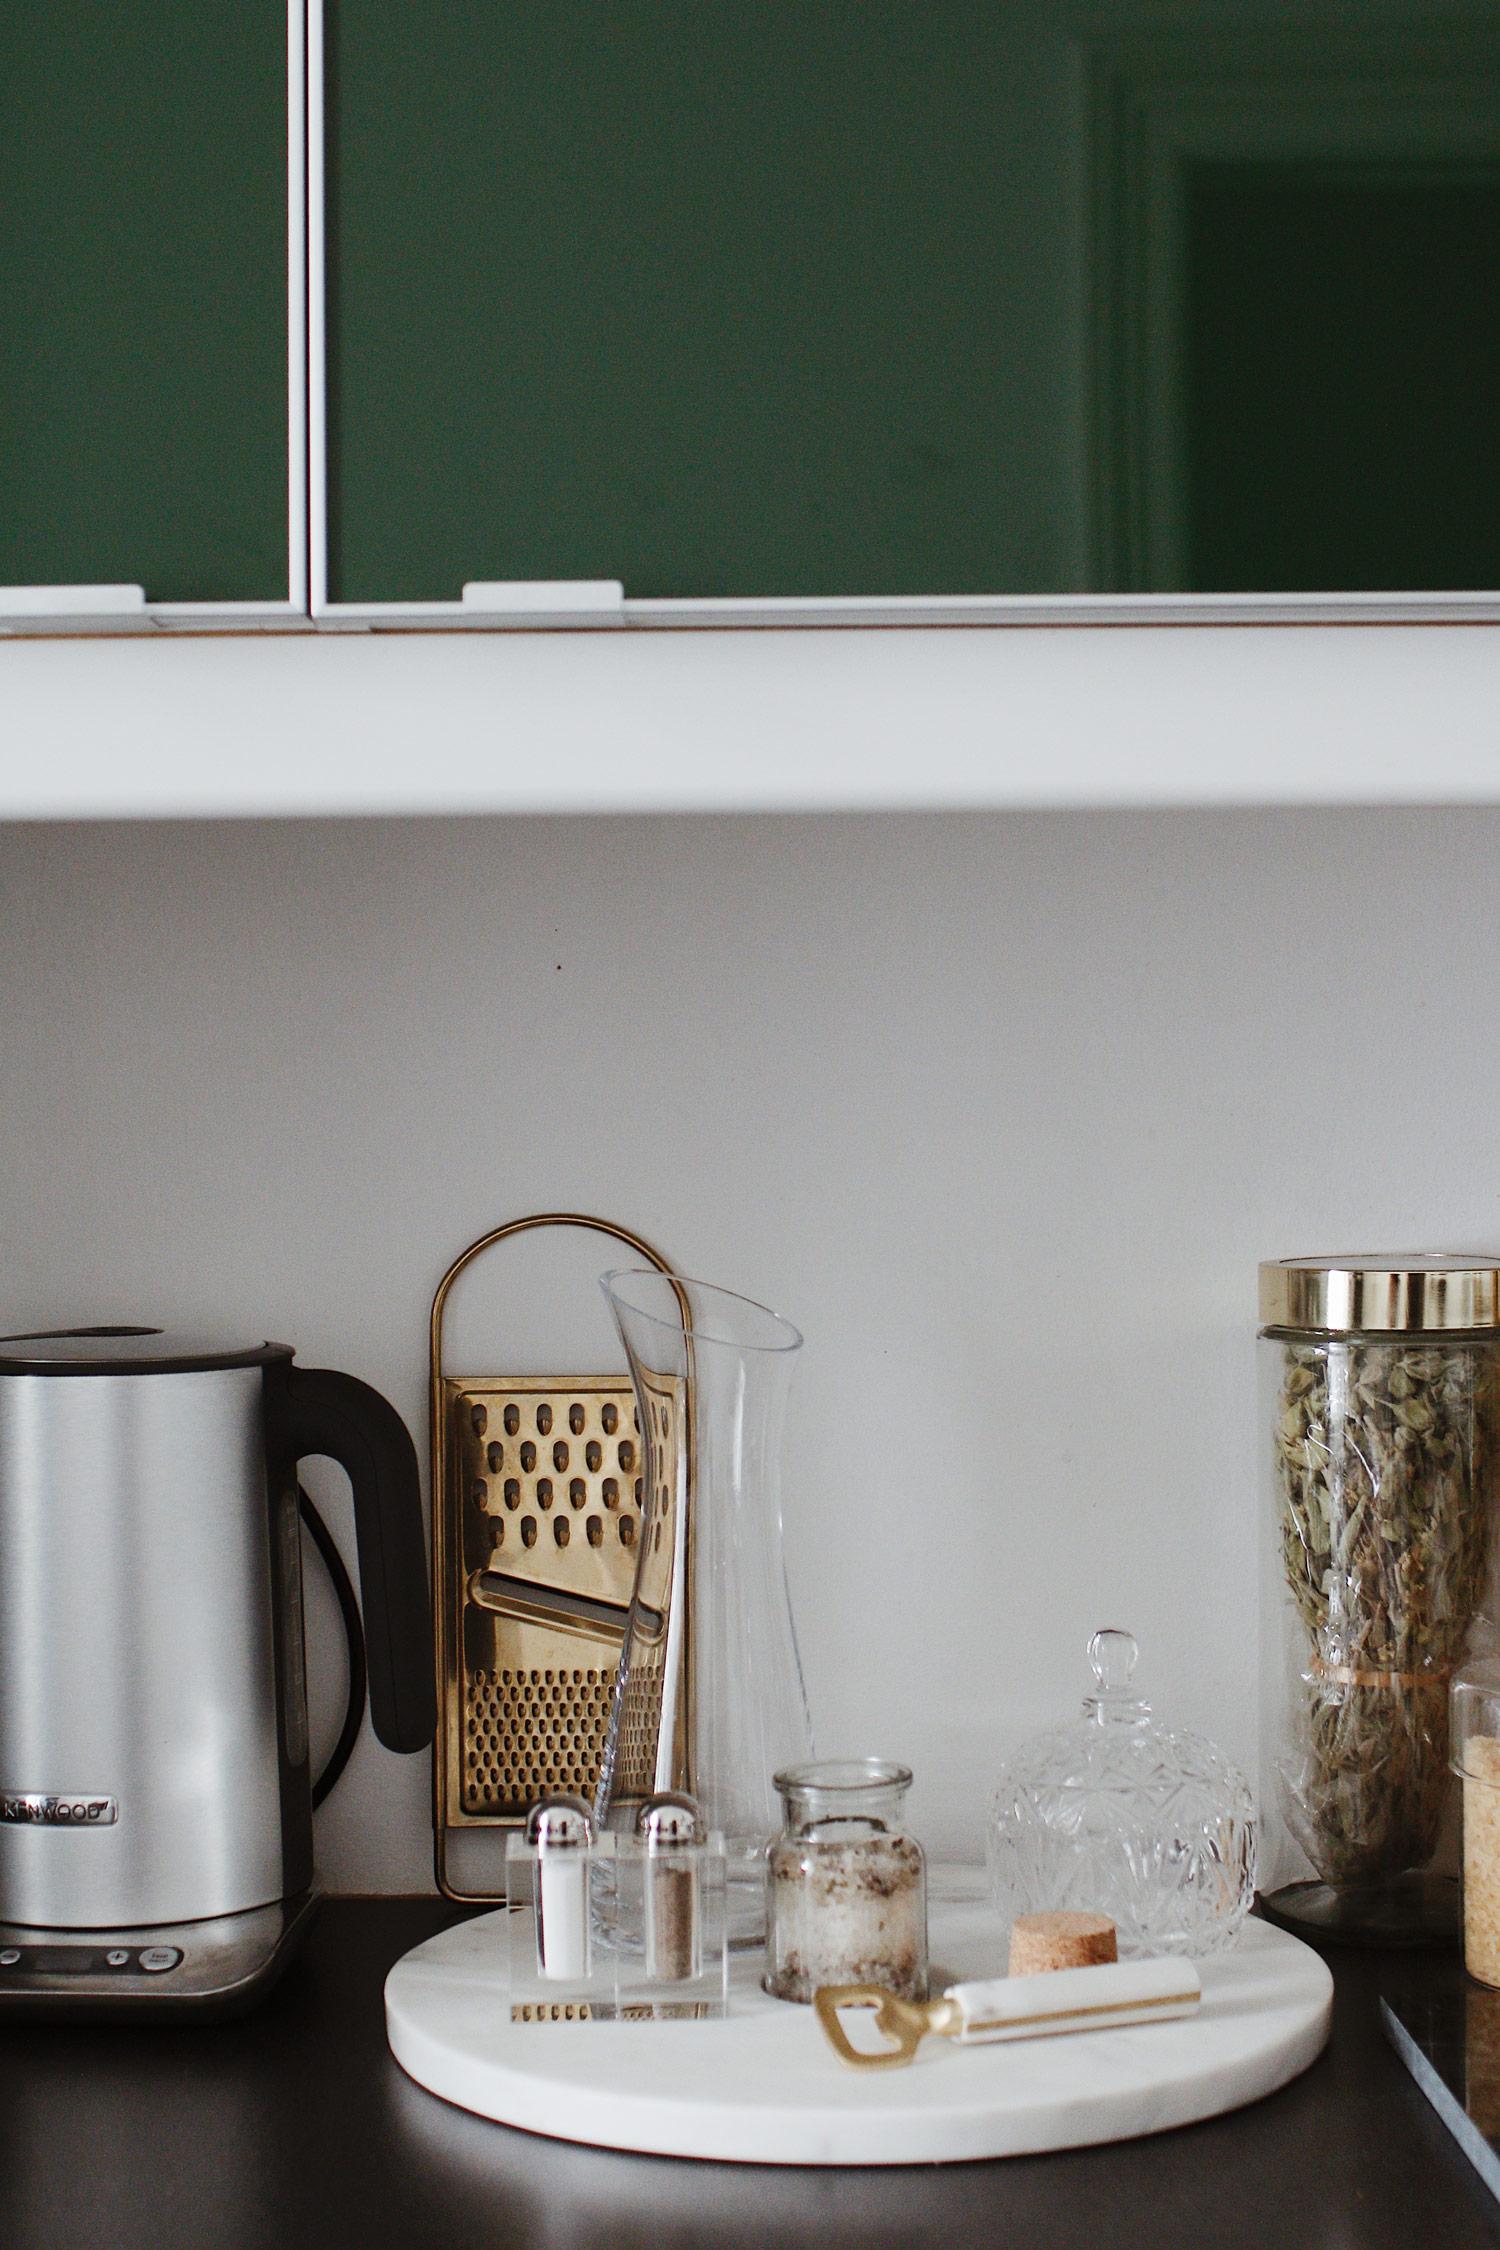 green kitchen - www.lesfactoryfemmes.com